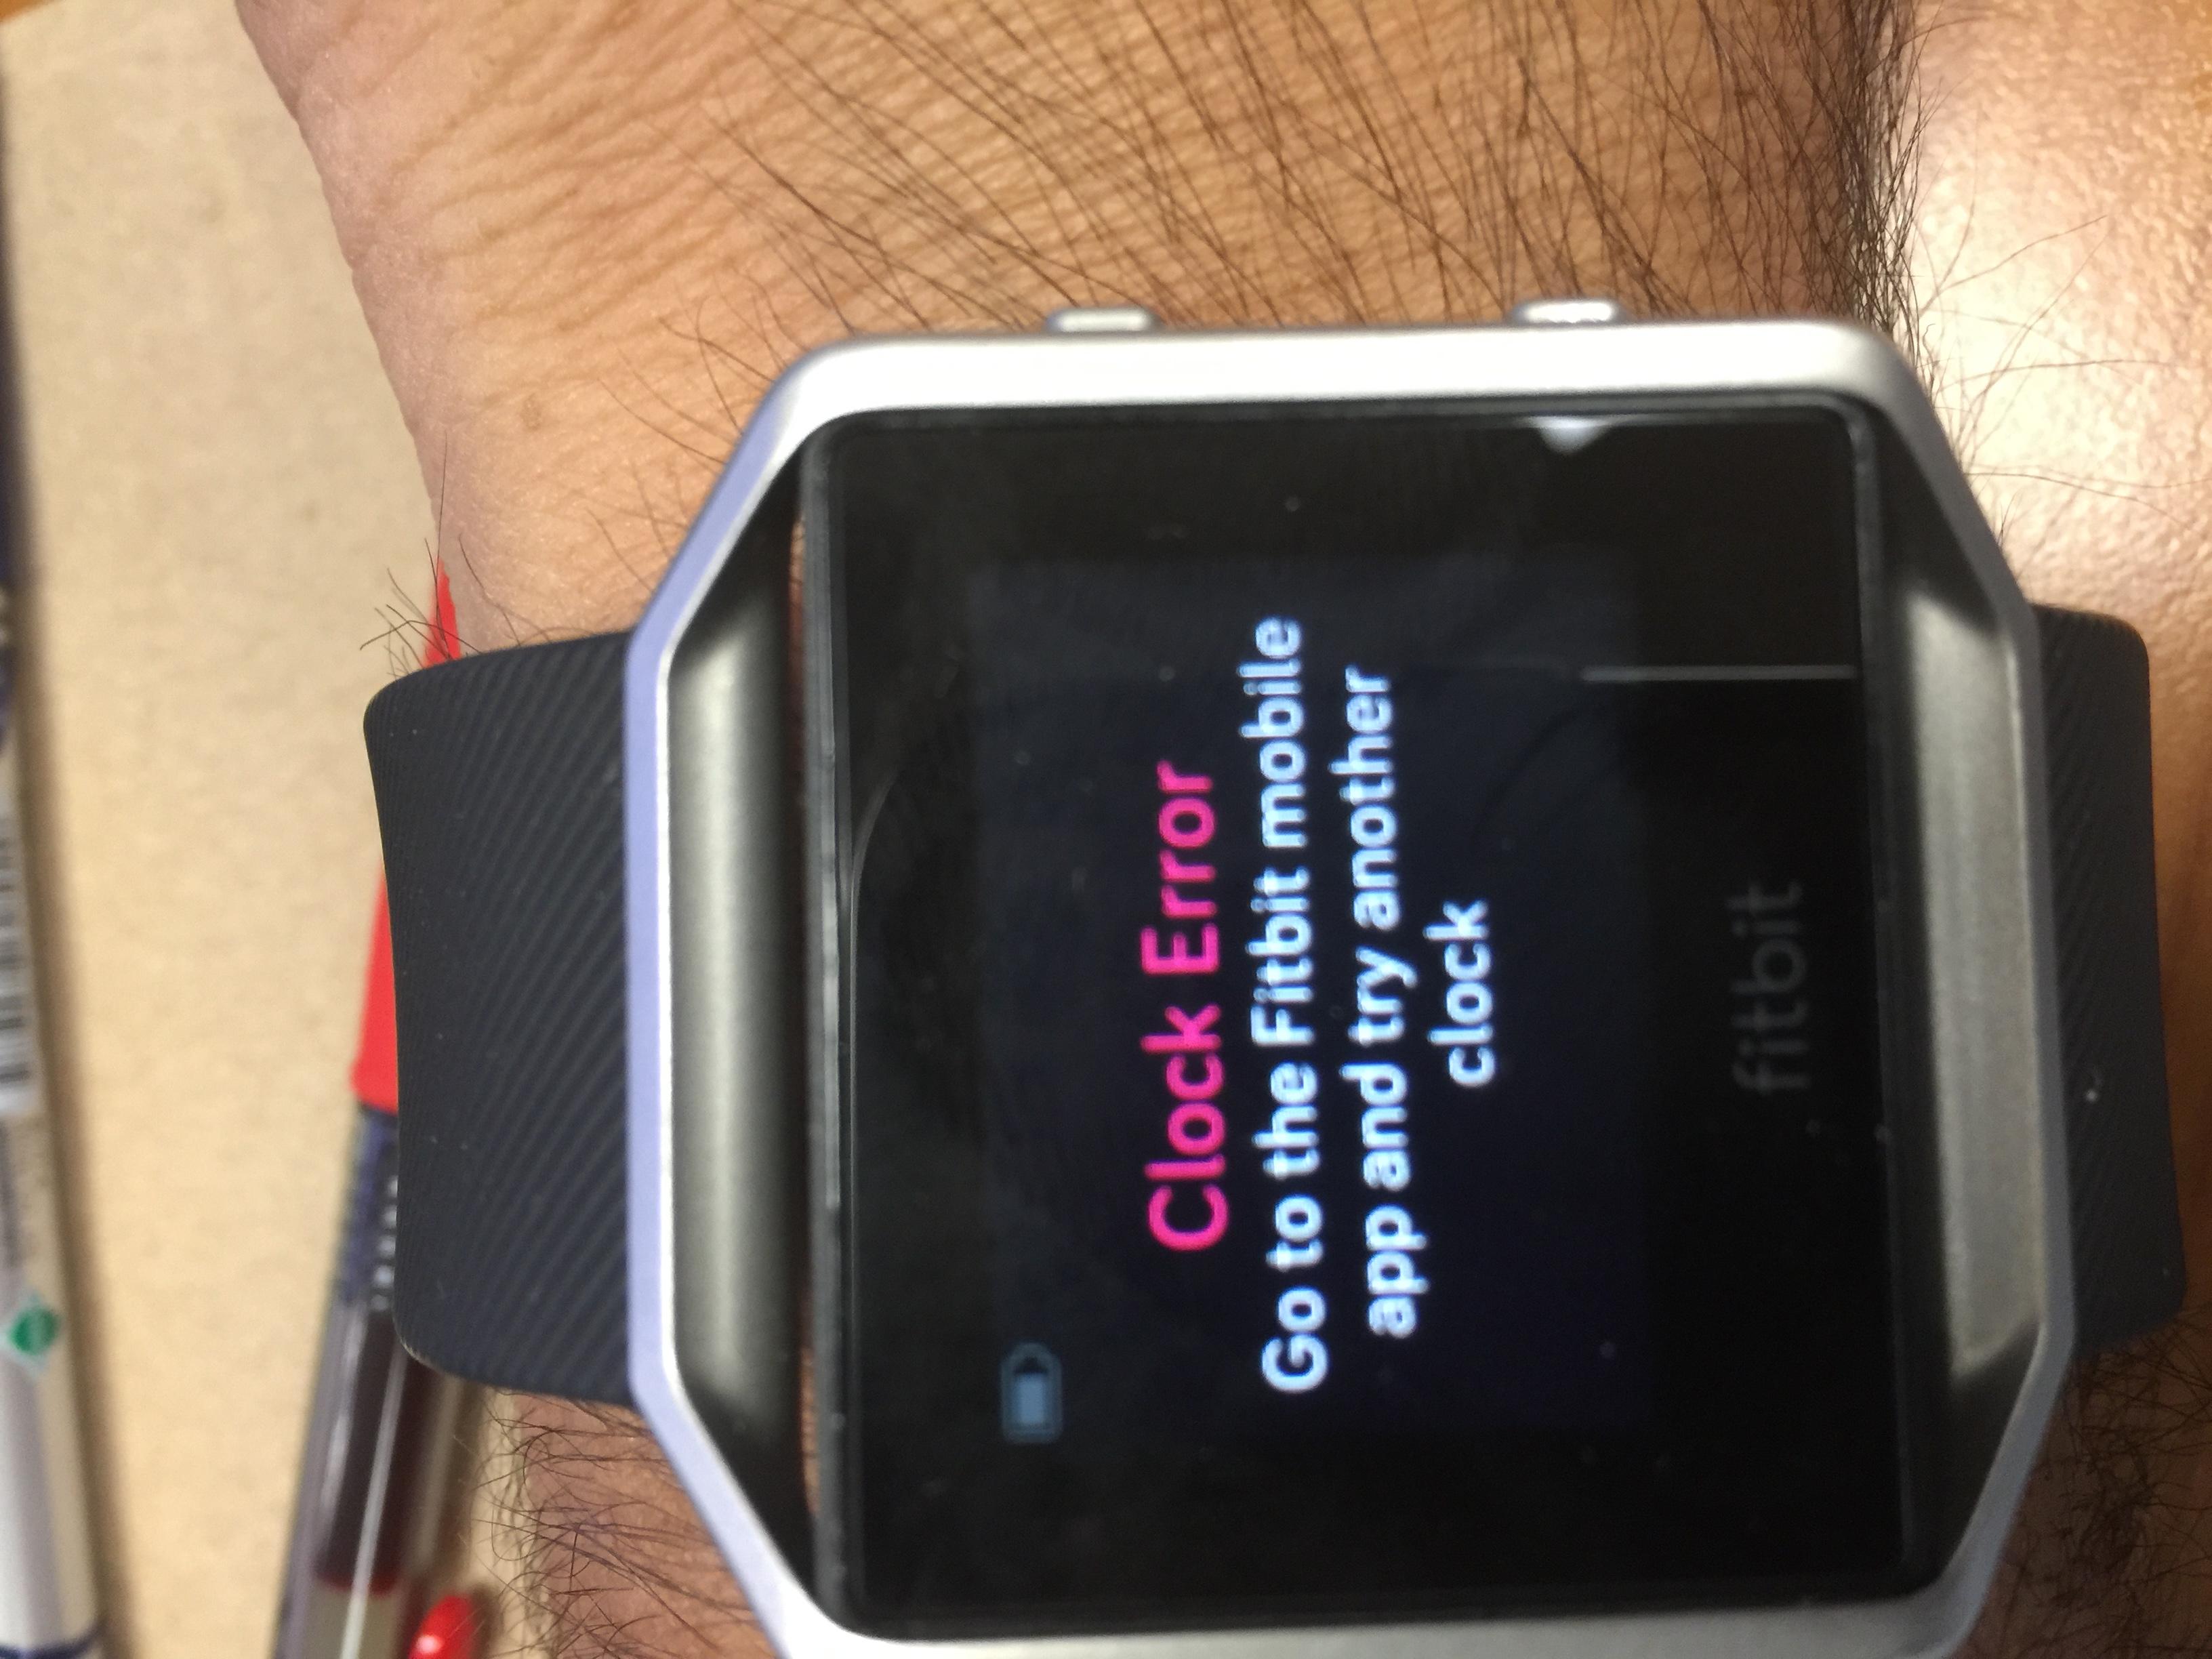 New Blaze Clock Faces Fitbit Community